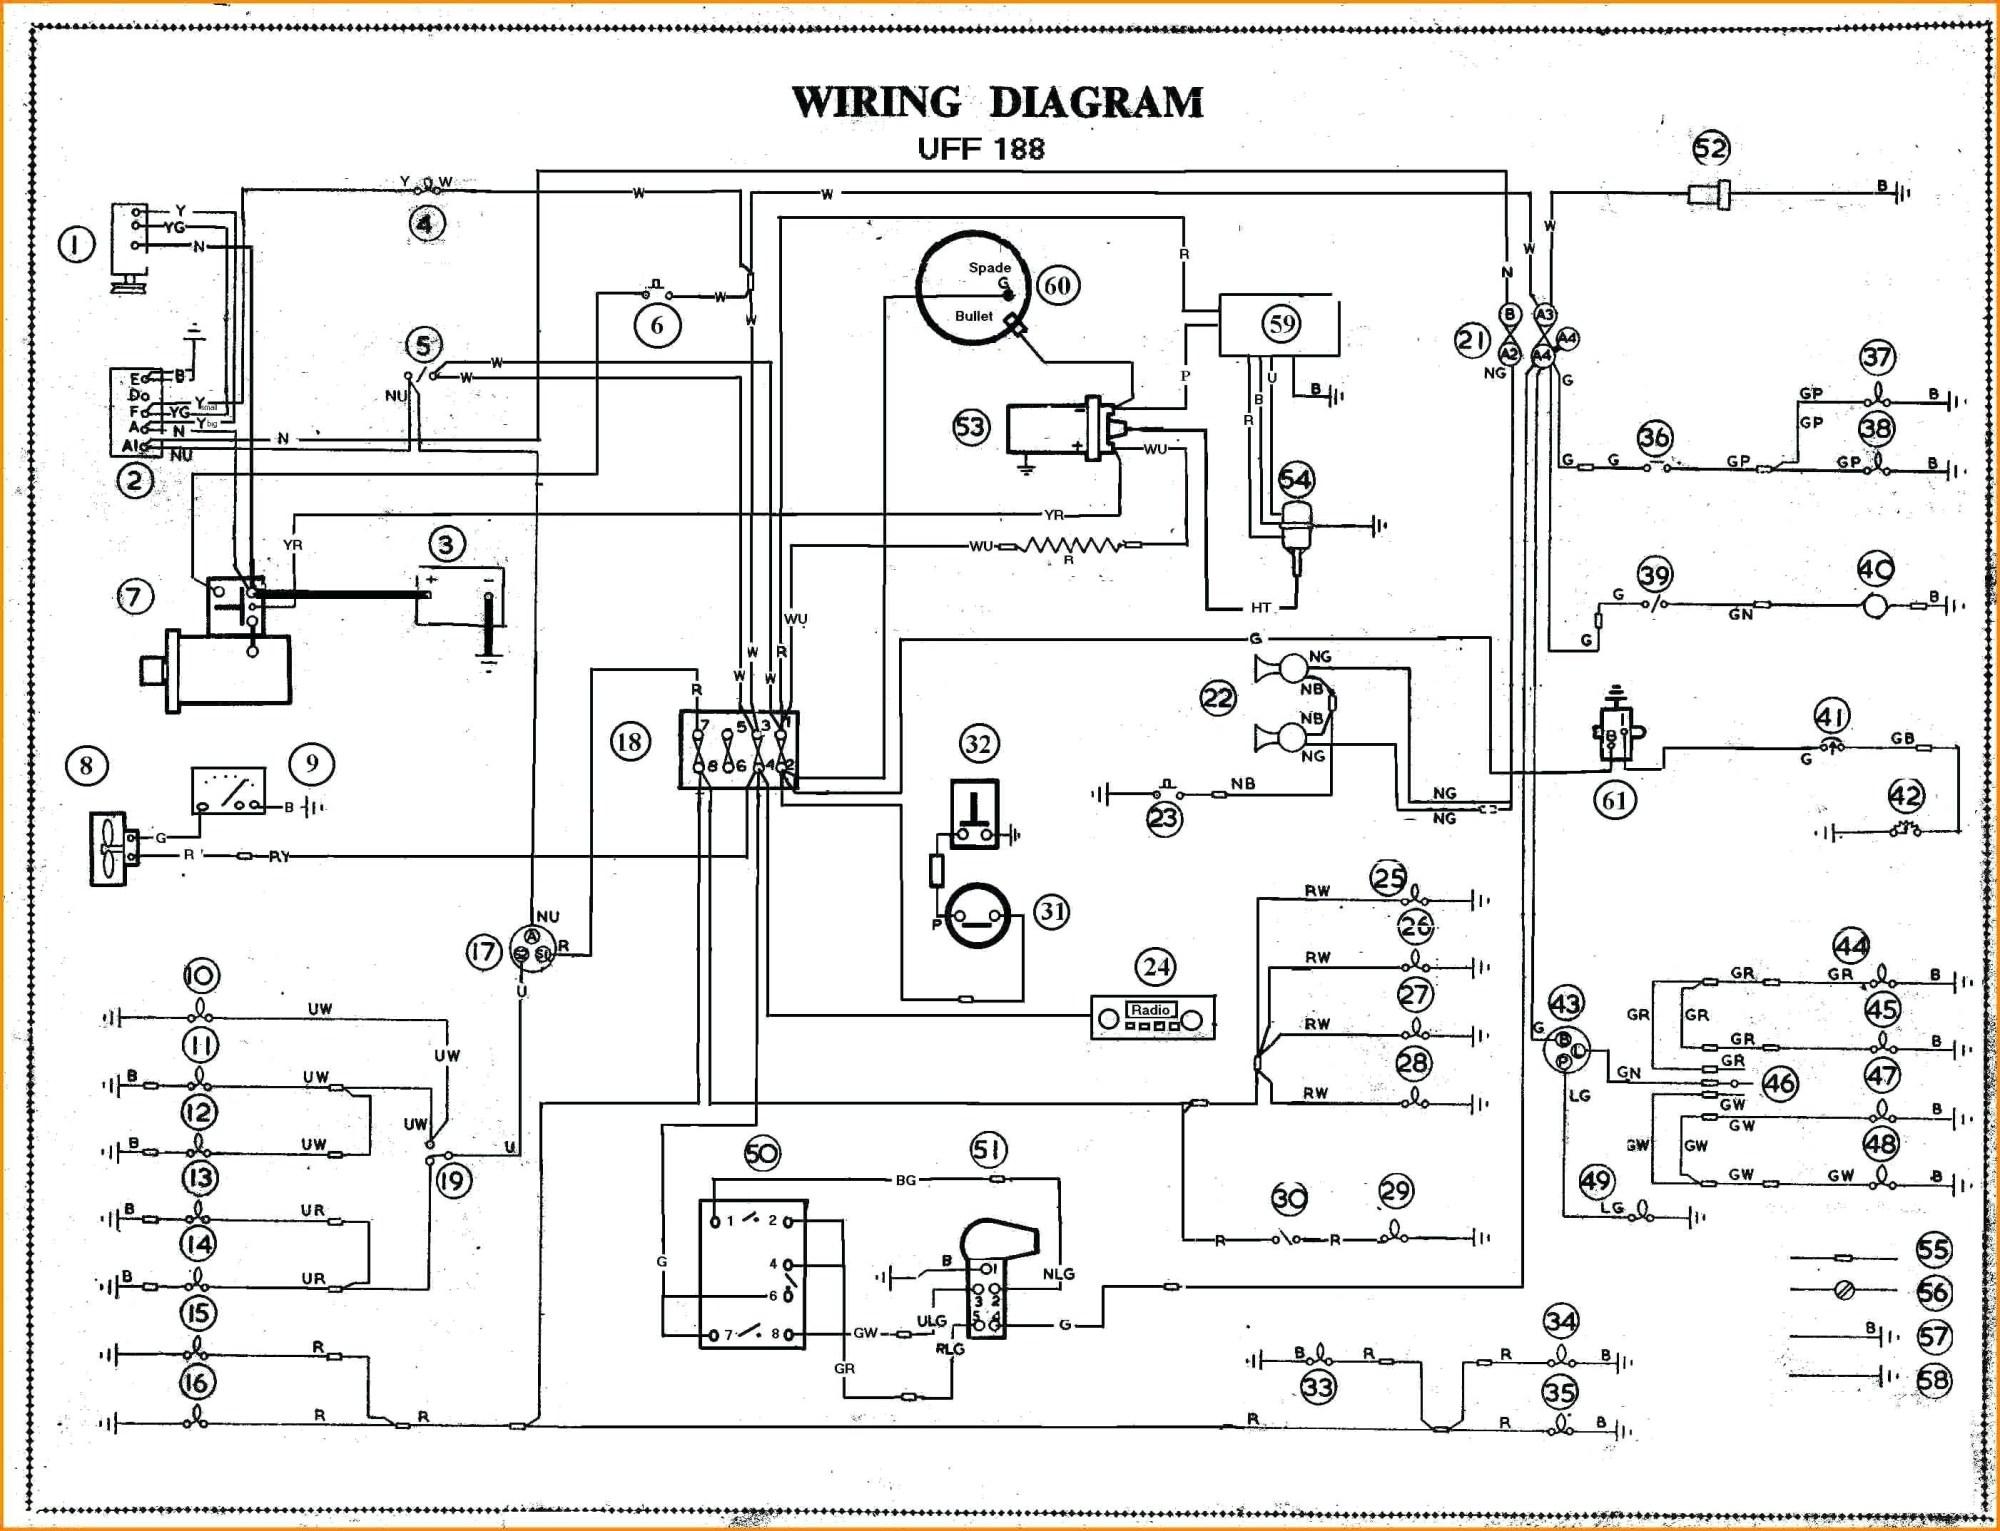 hight resolution of alternator wiring diagram for melroe 610 schema diagram database bobcat s250 alternator wiring diagram alternator wiring